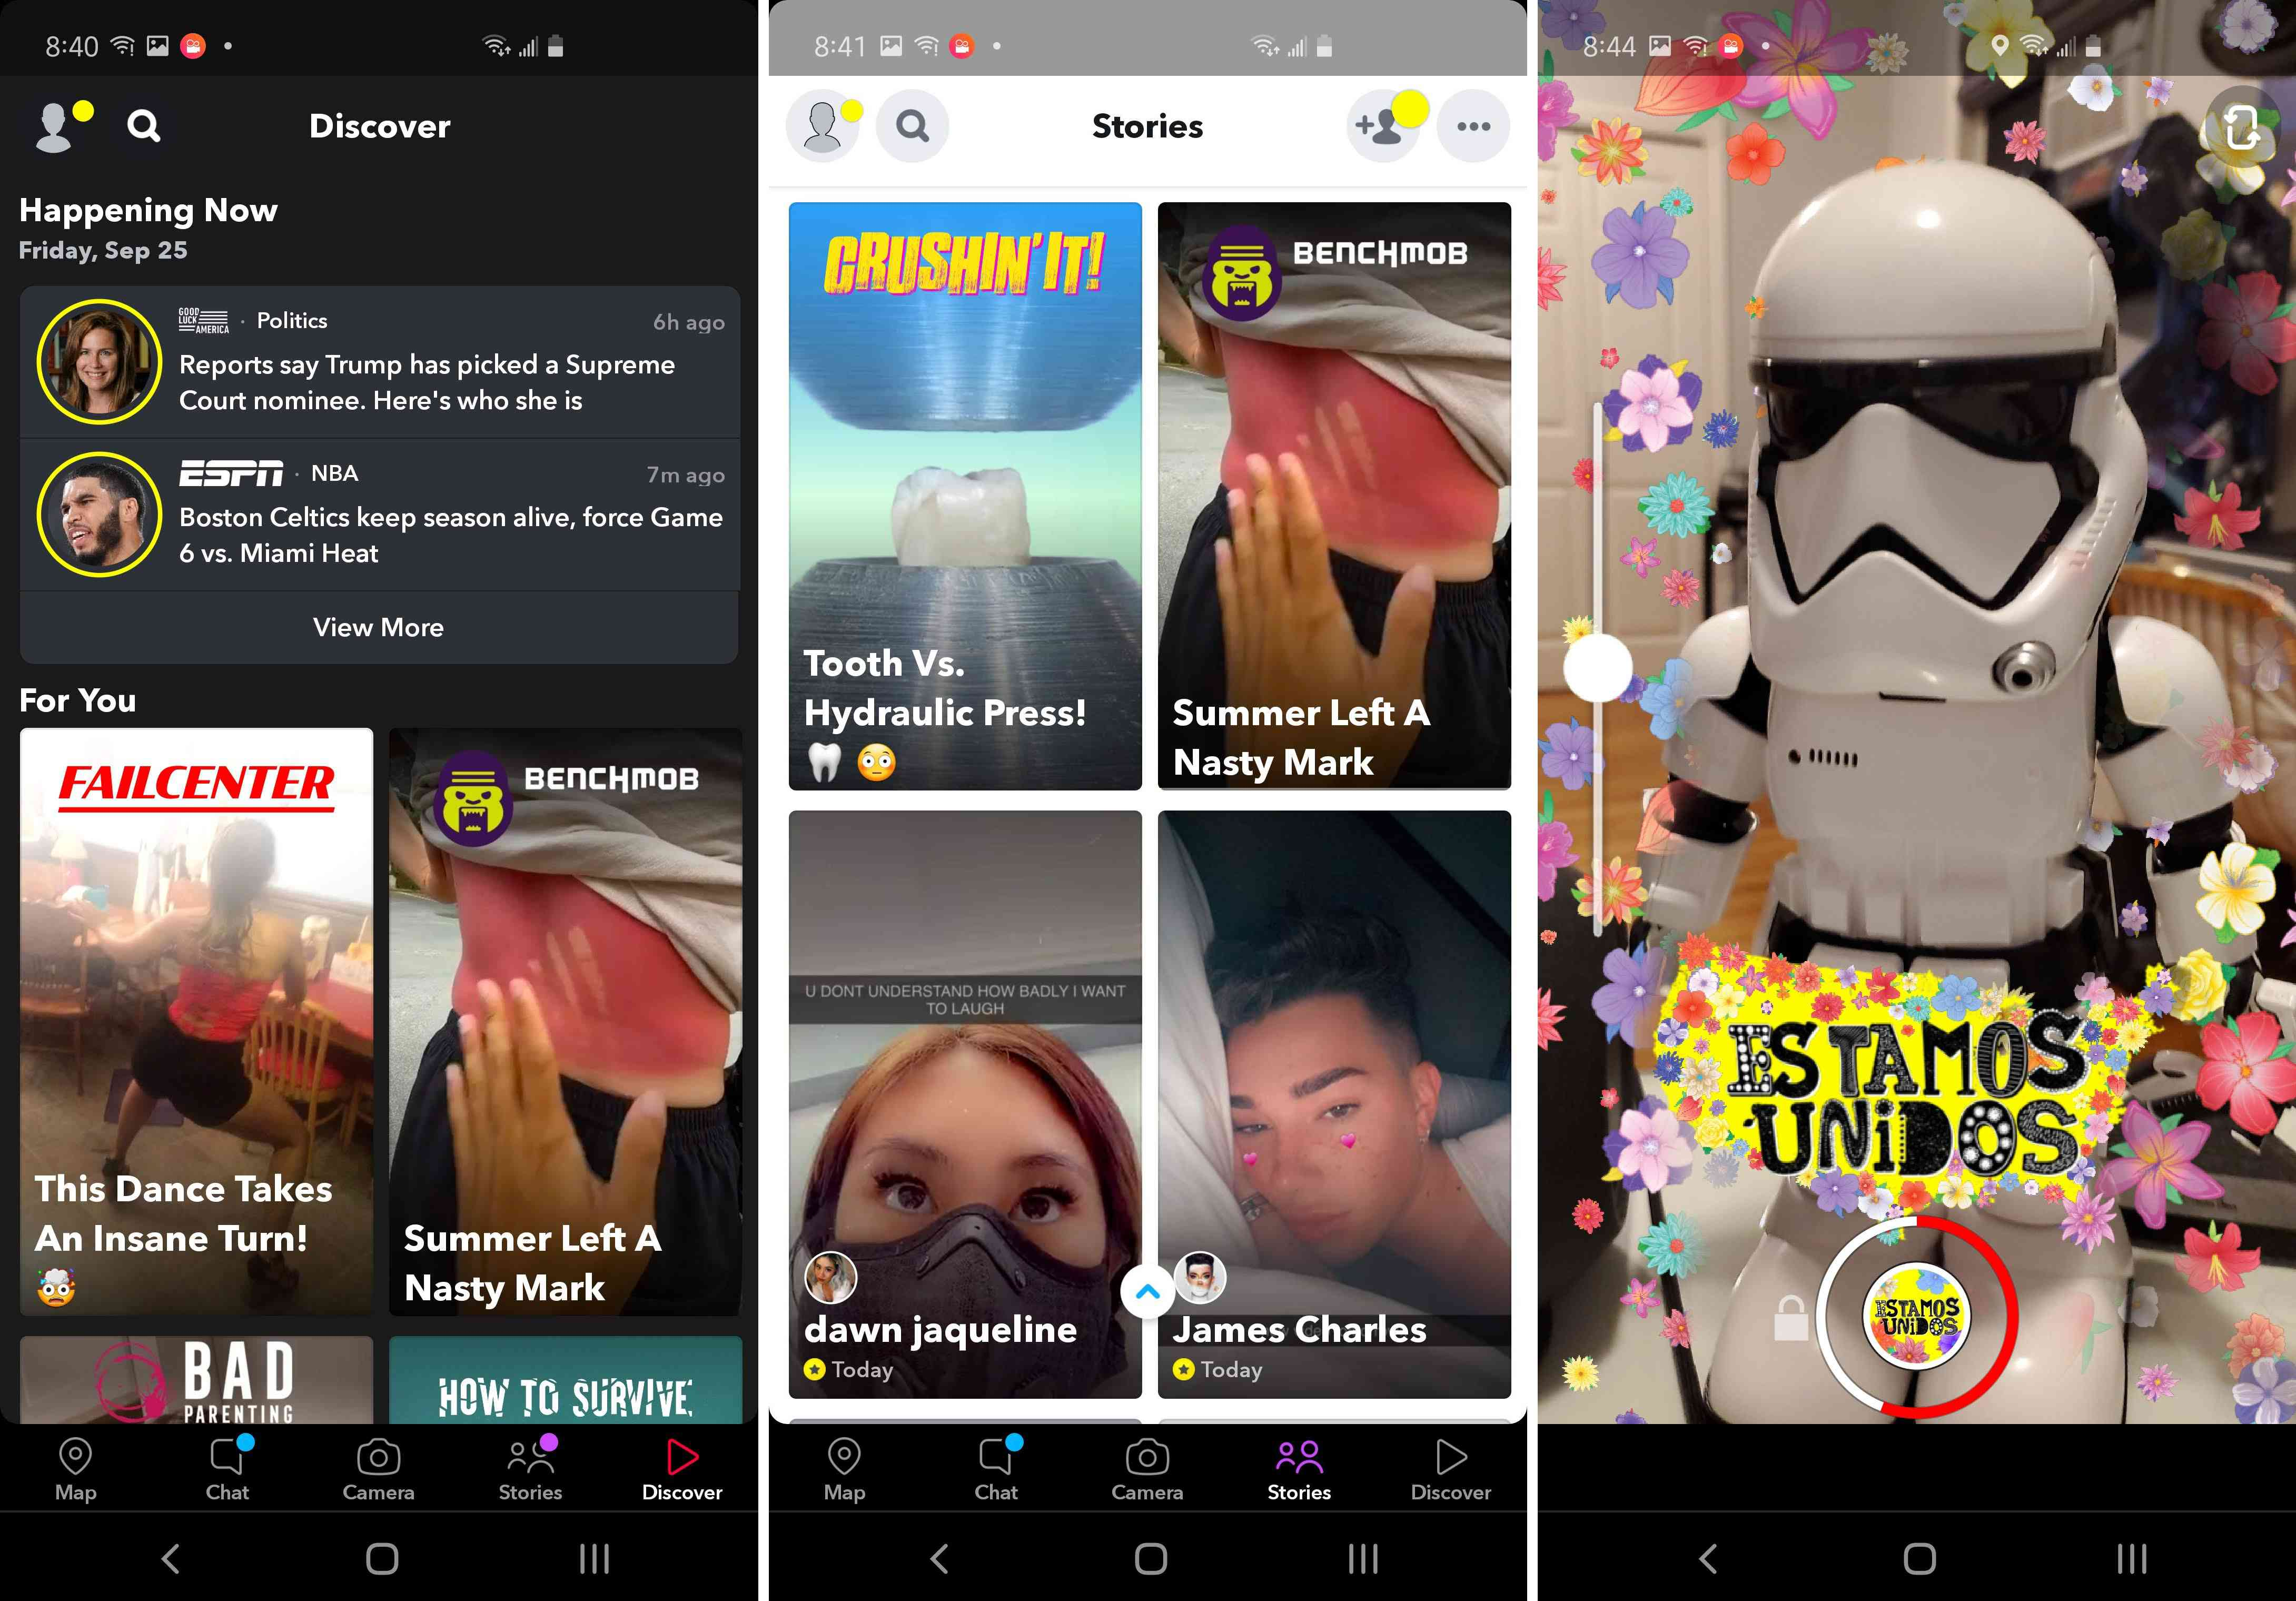 Three views of the Snapchat app